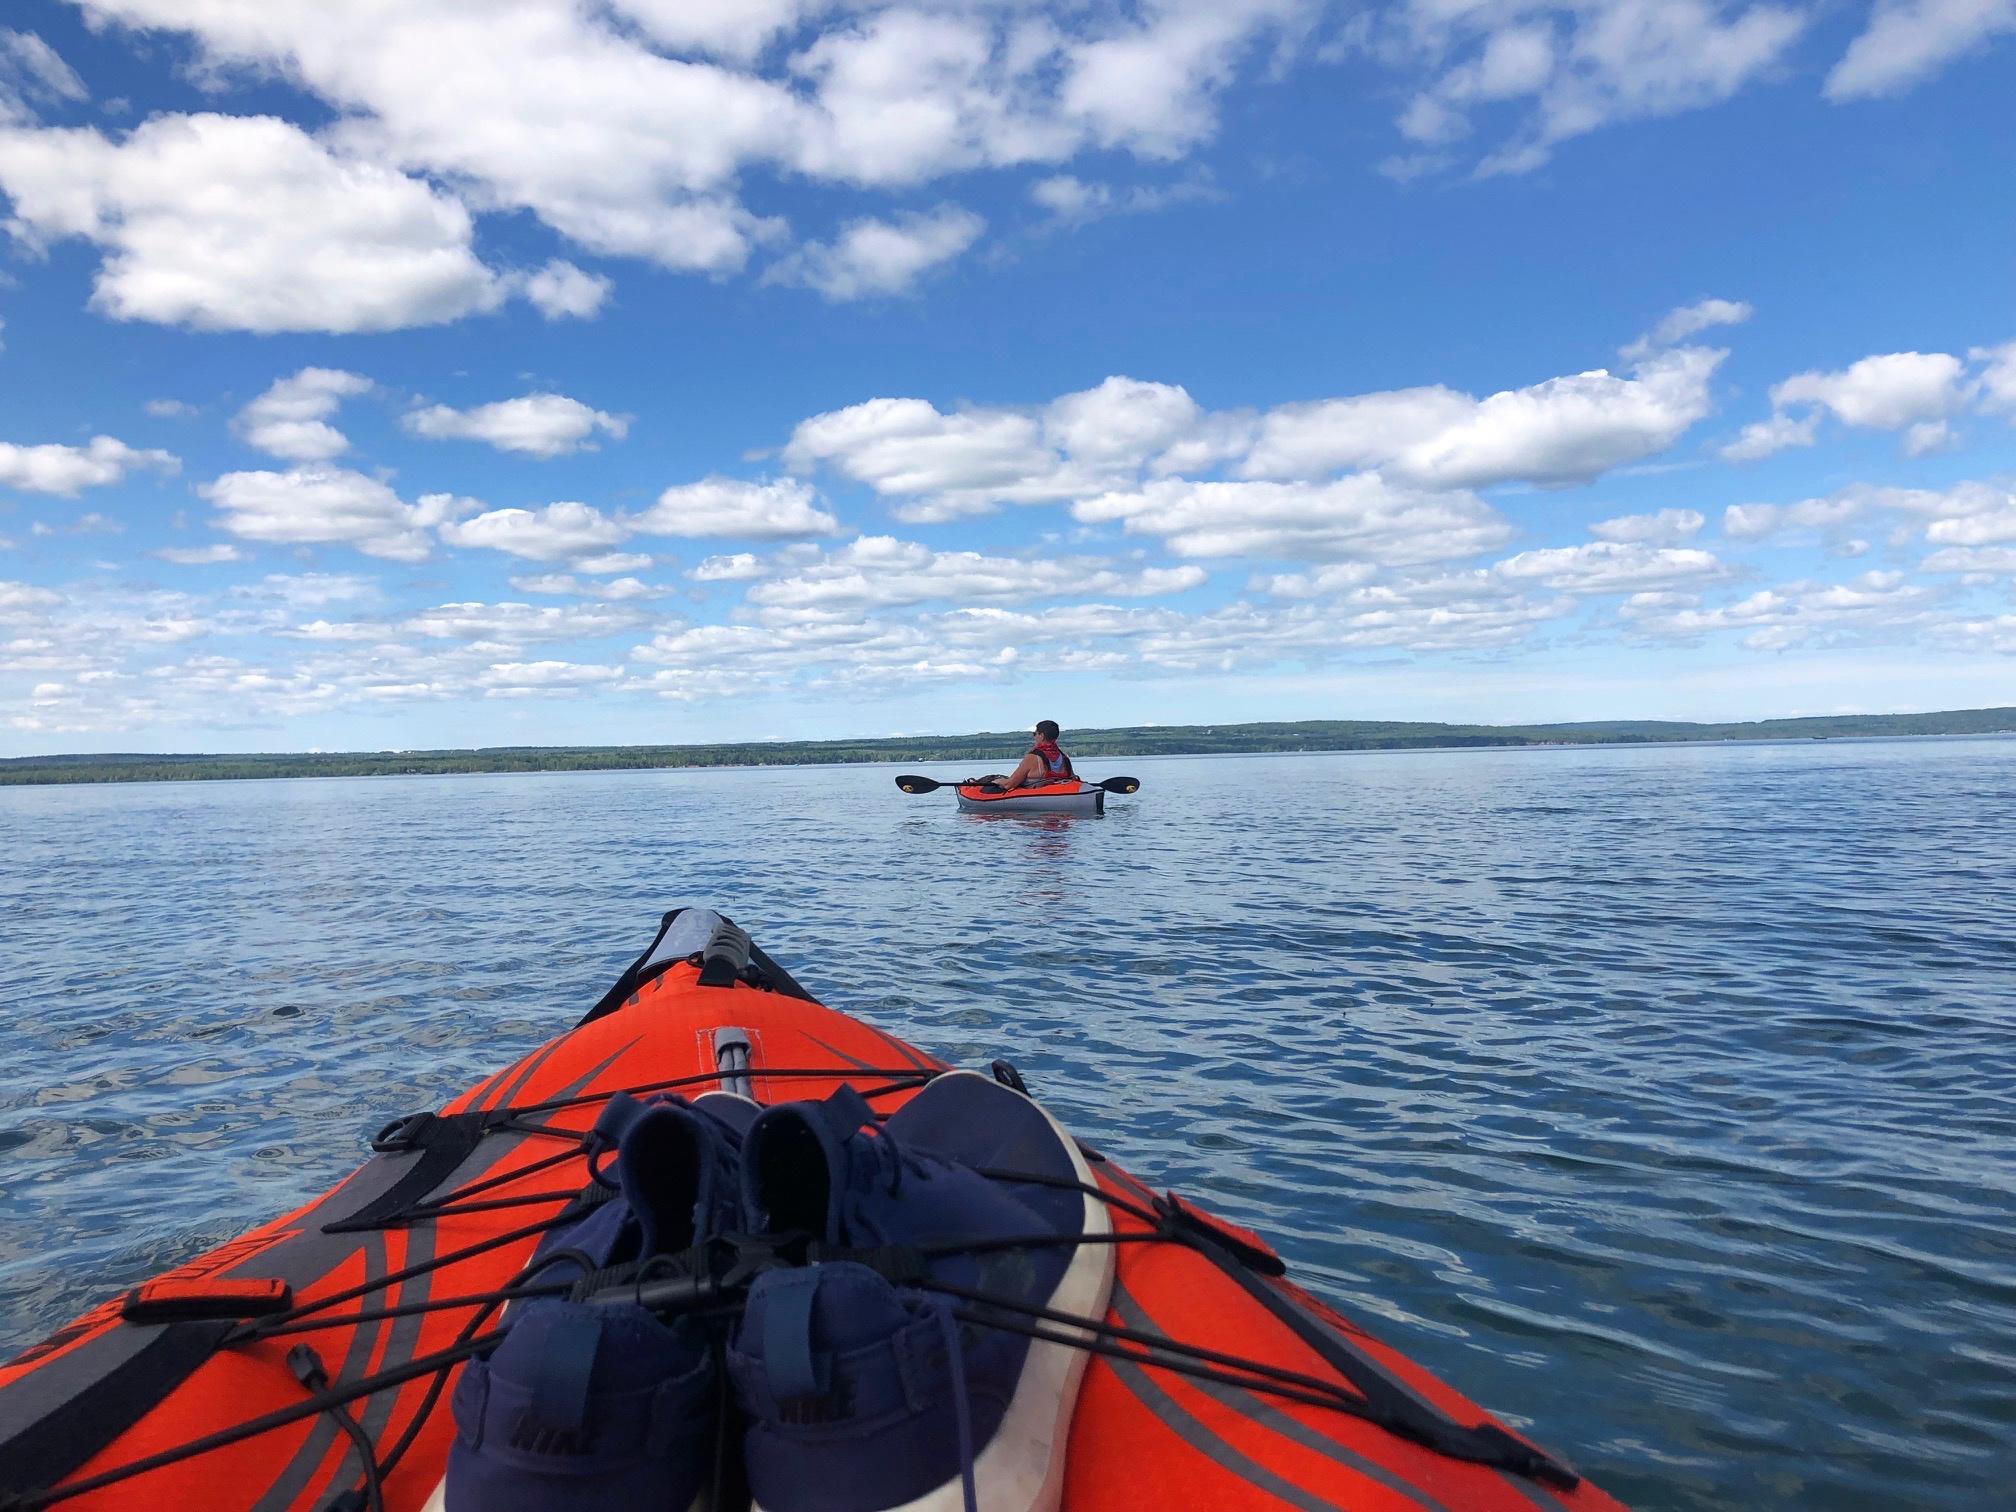 Suze kayaking on THE biggest lake. Salt free and no sharks!